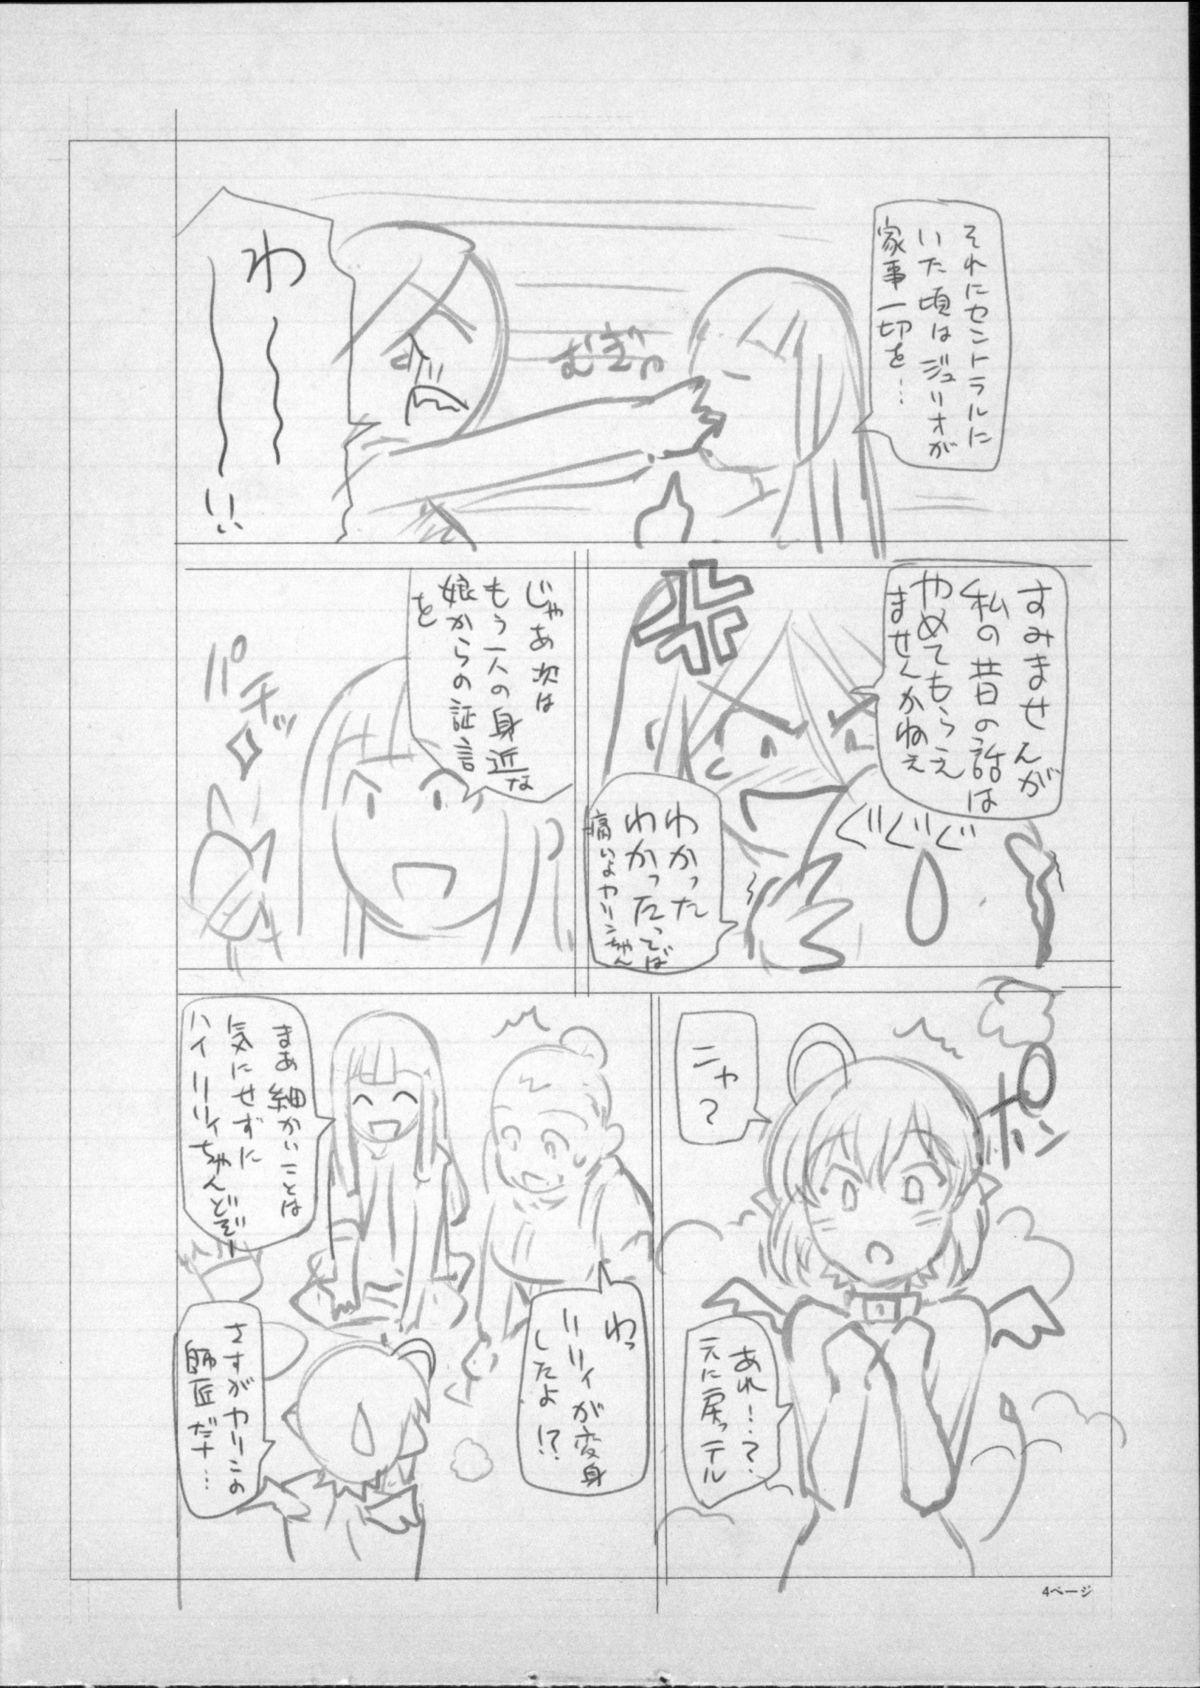 Majo × Shota ~ Genteiban | 魔女X小正太 限定版 259